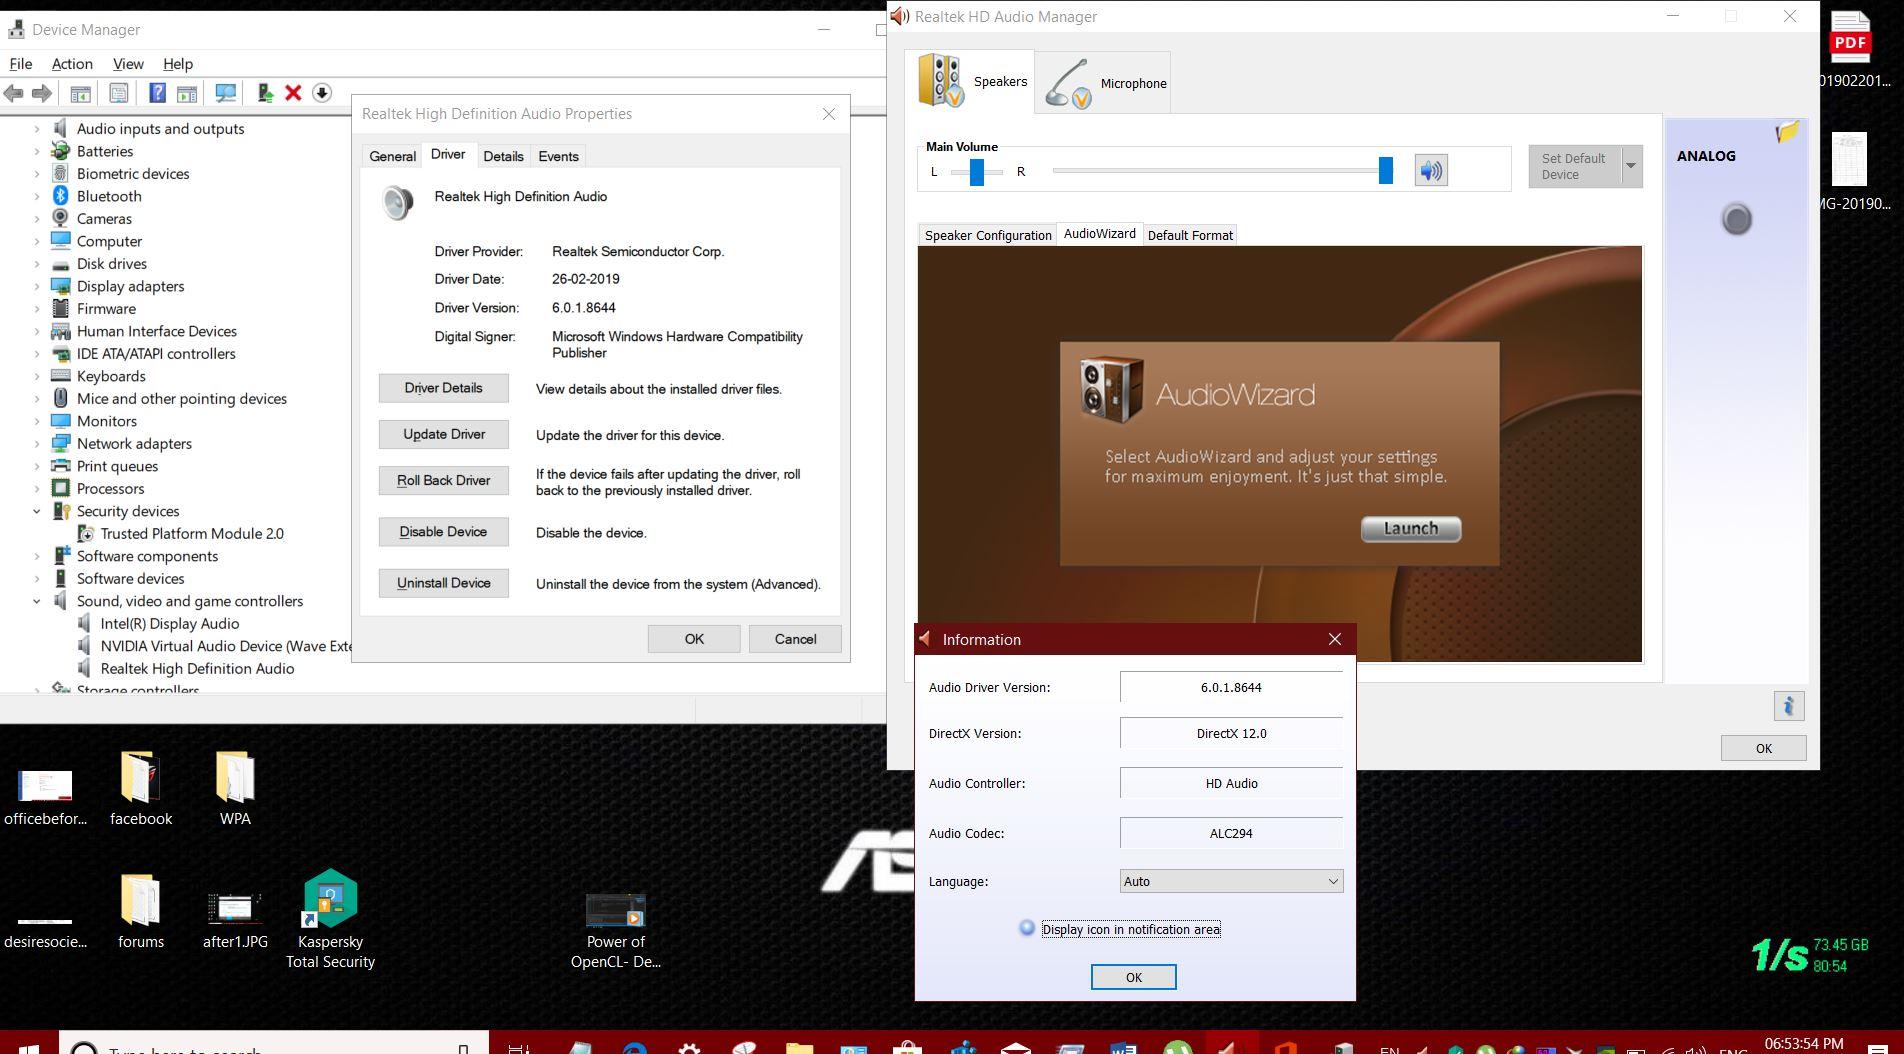 realtek hd audio driver windows 10 64 bit download free